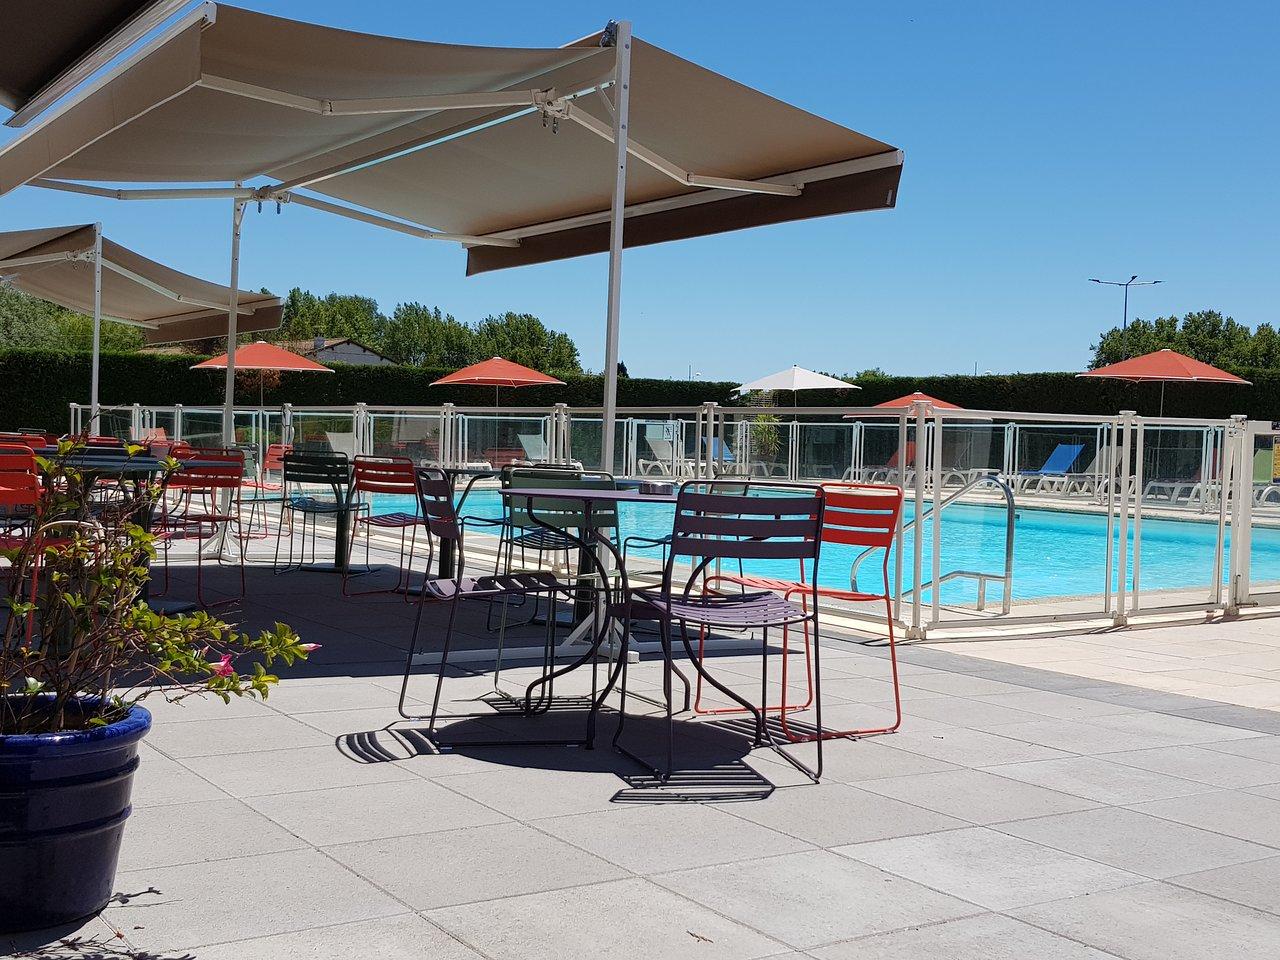 The 5 Best Accor Hotels In Arles, France - Tripadvisor concernant Piscine Saint Martin De Crau